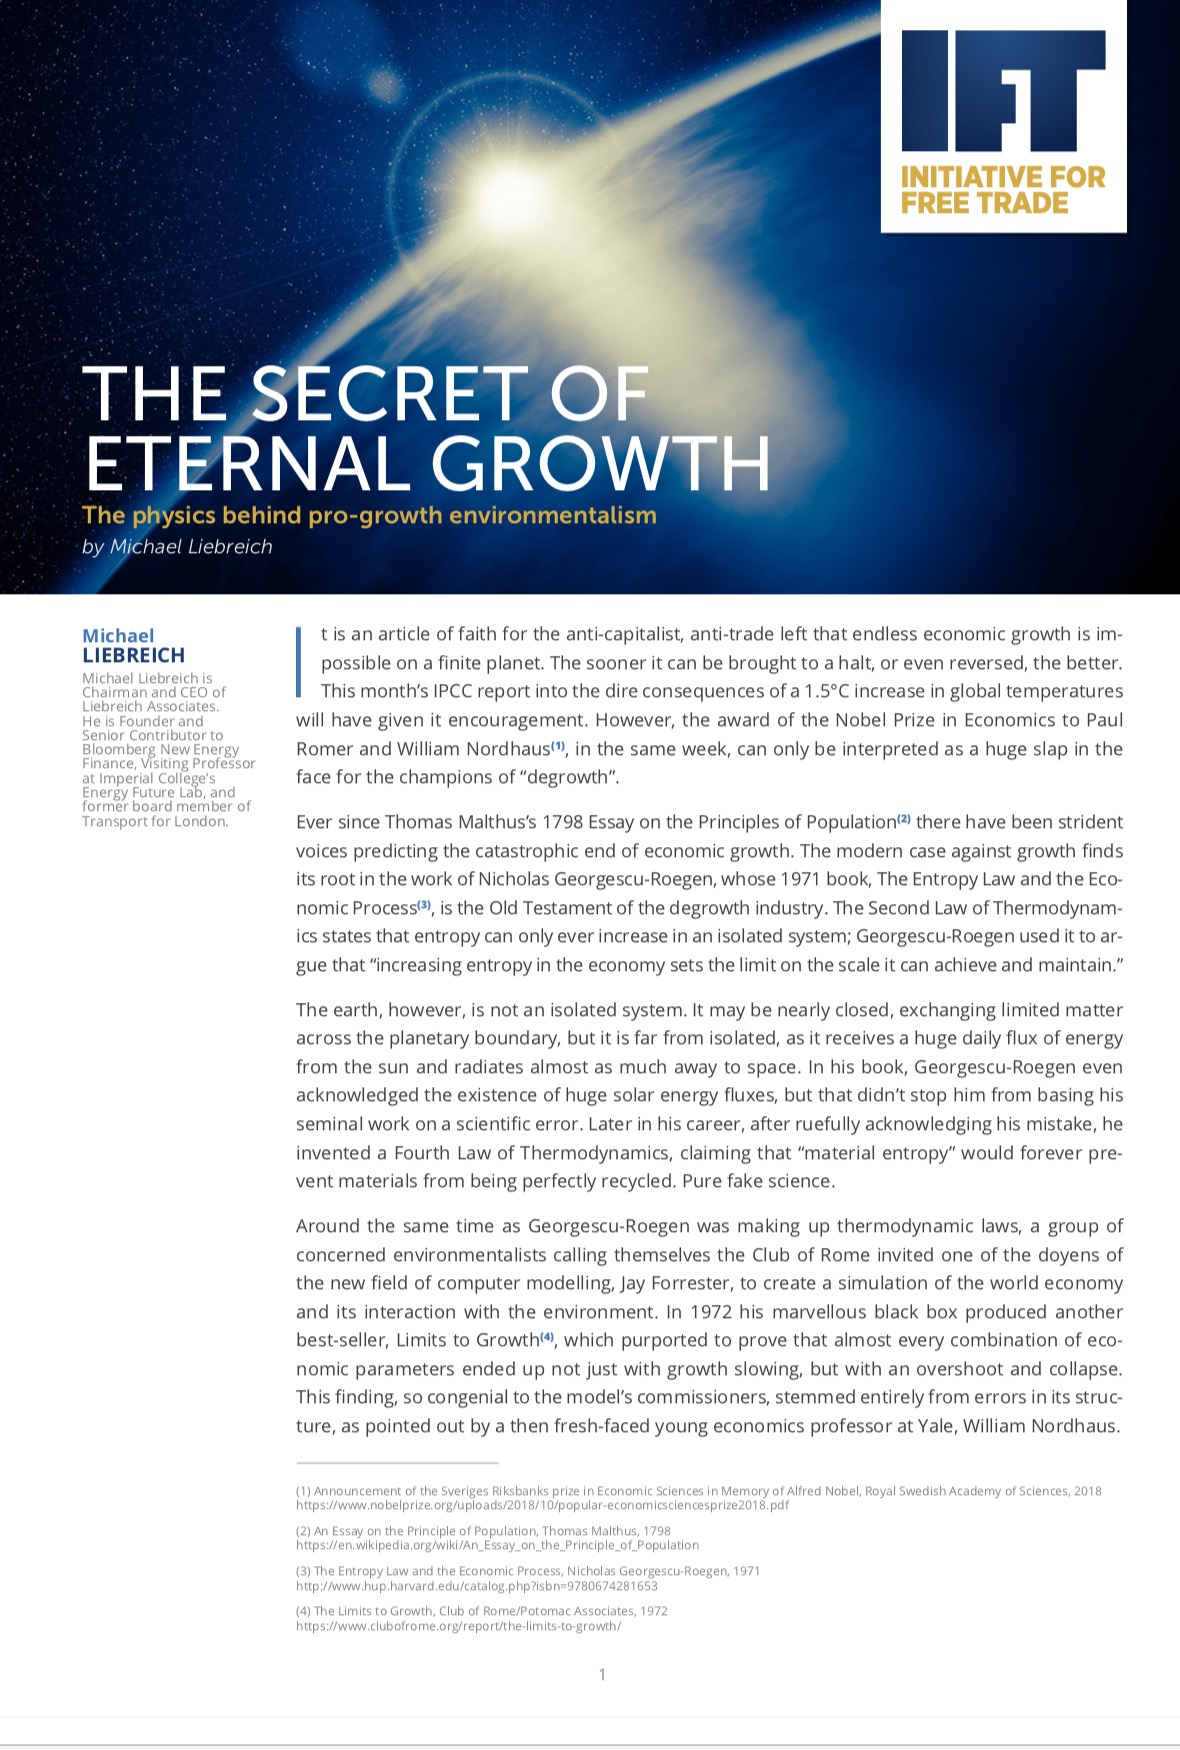 The secret of eternal growth